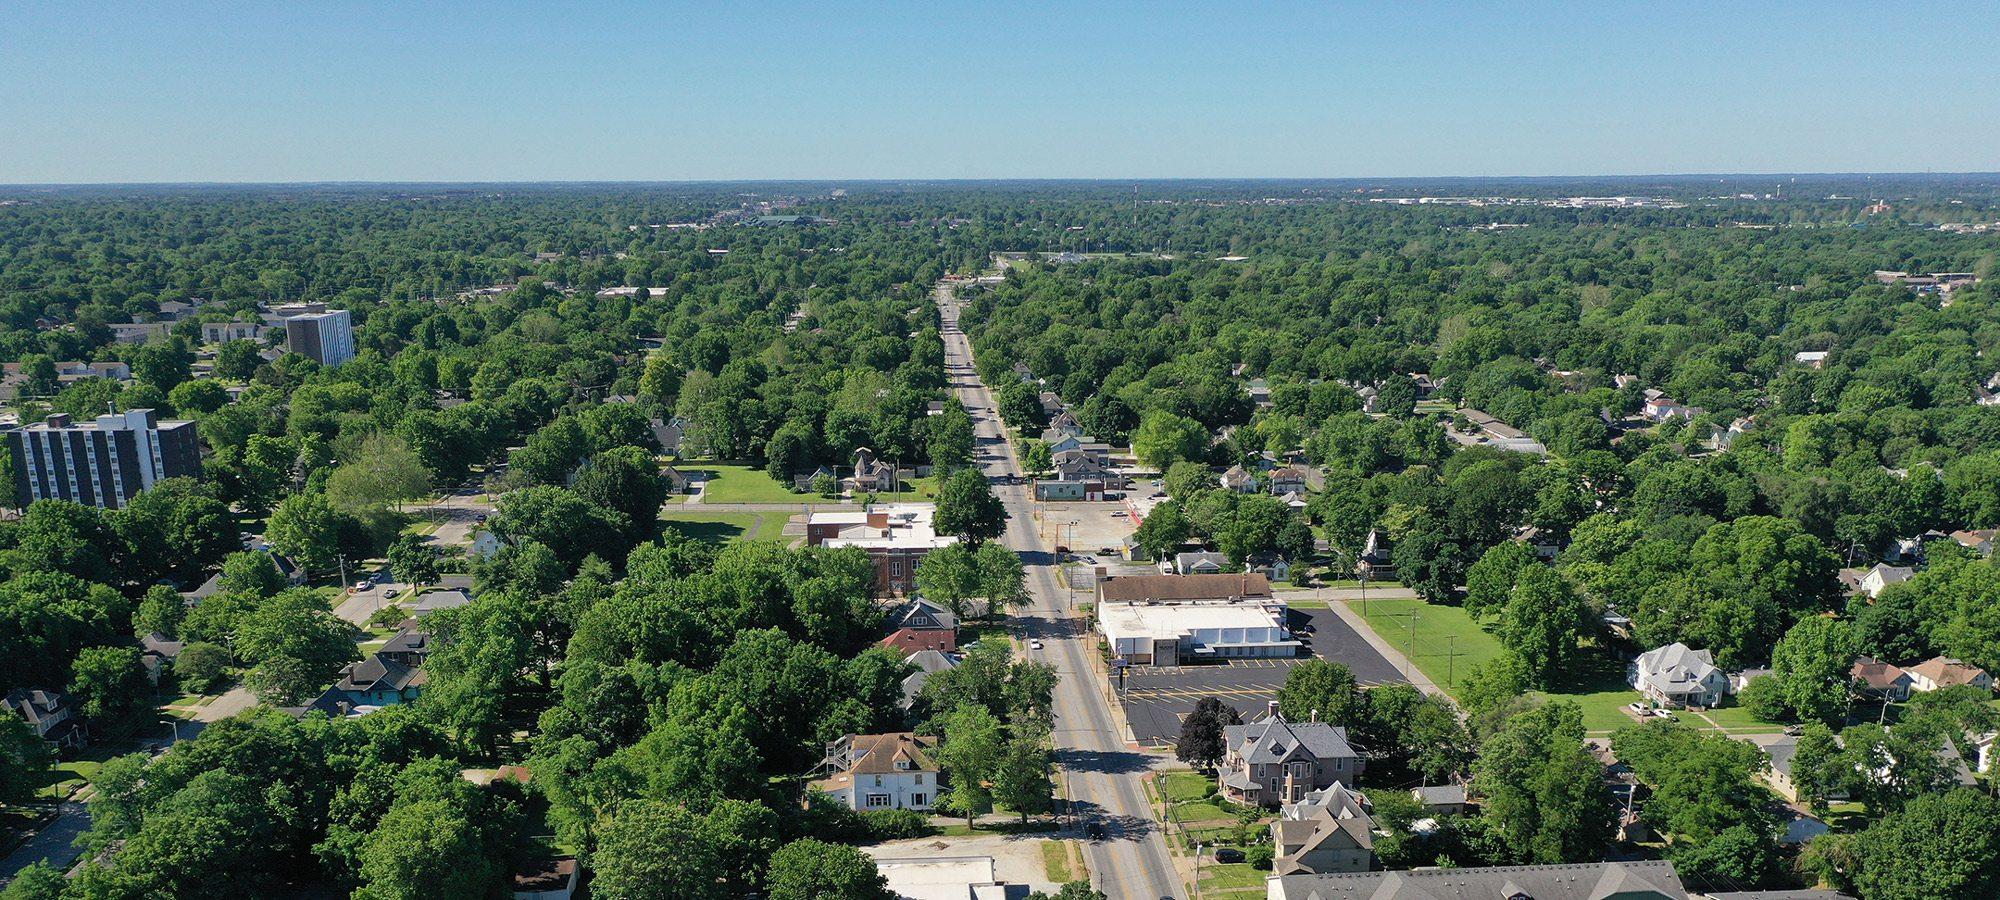 Grant Parkway Avenue aerial photo